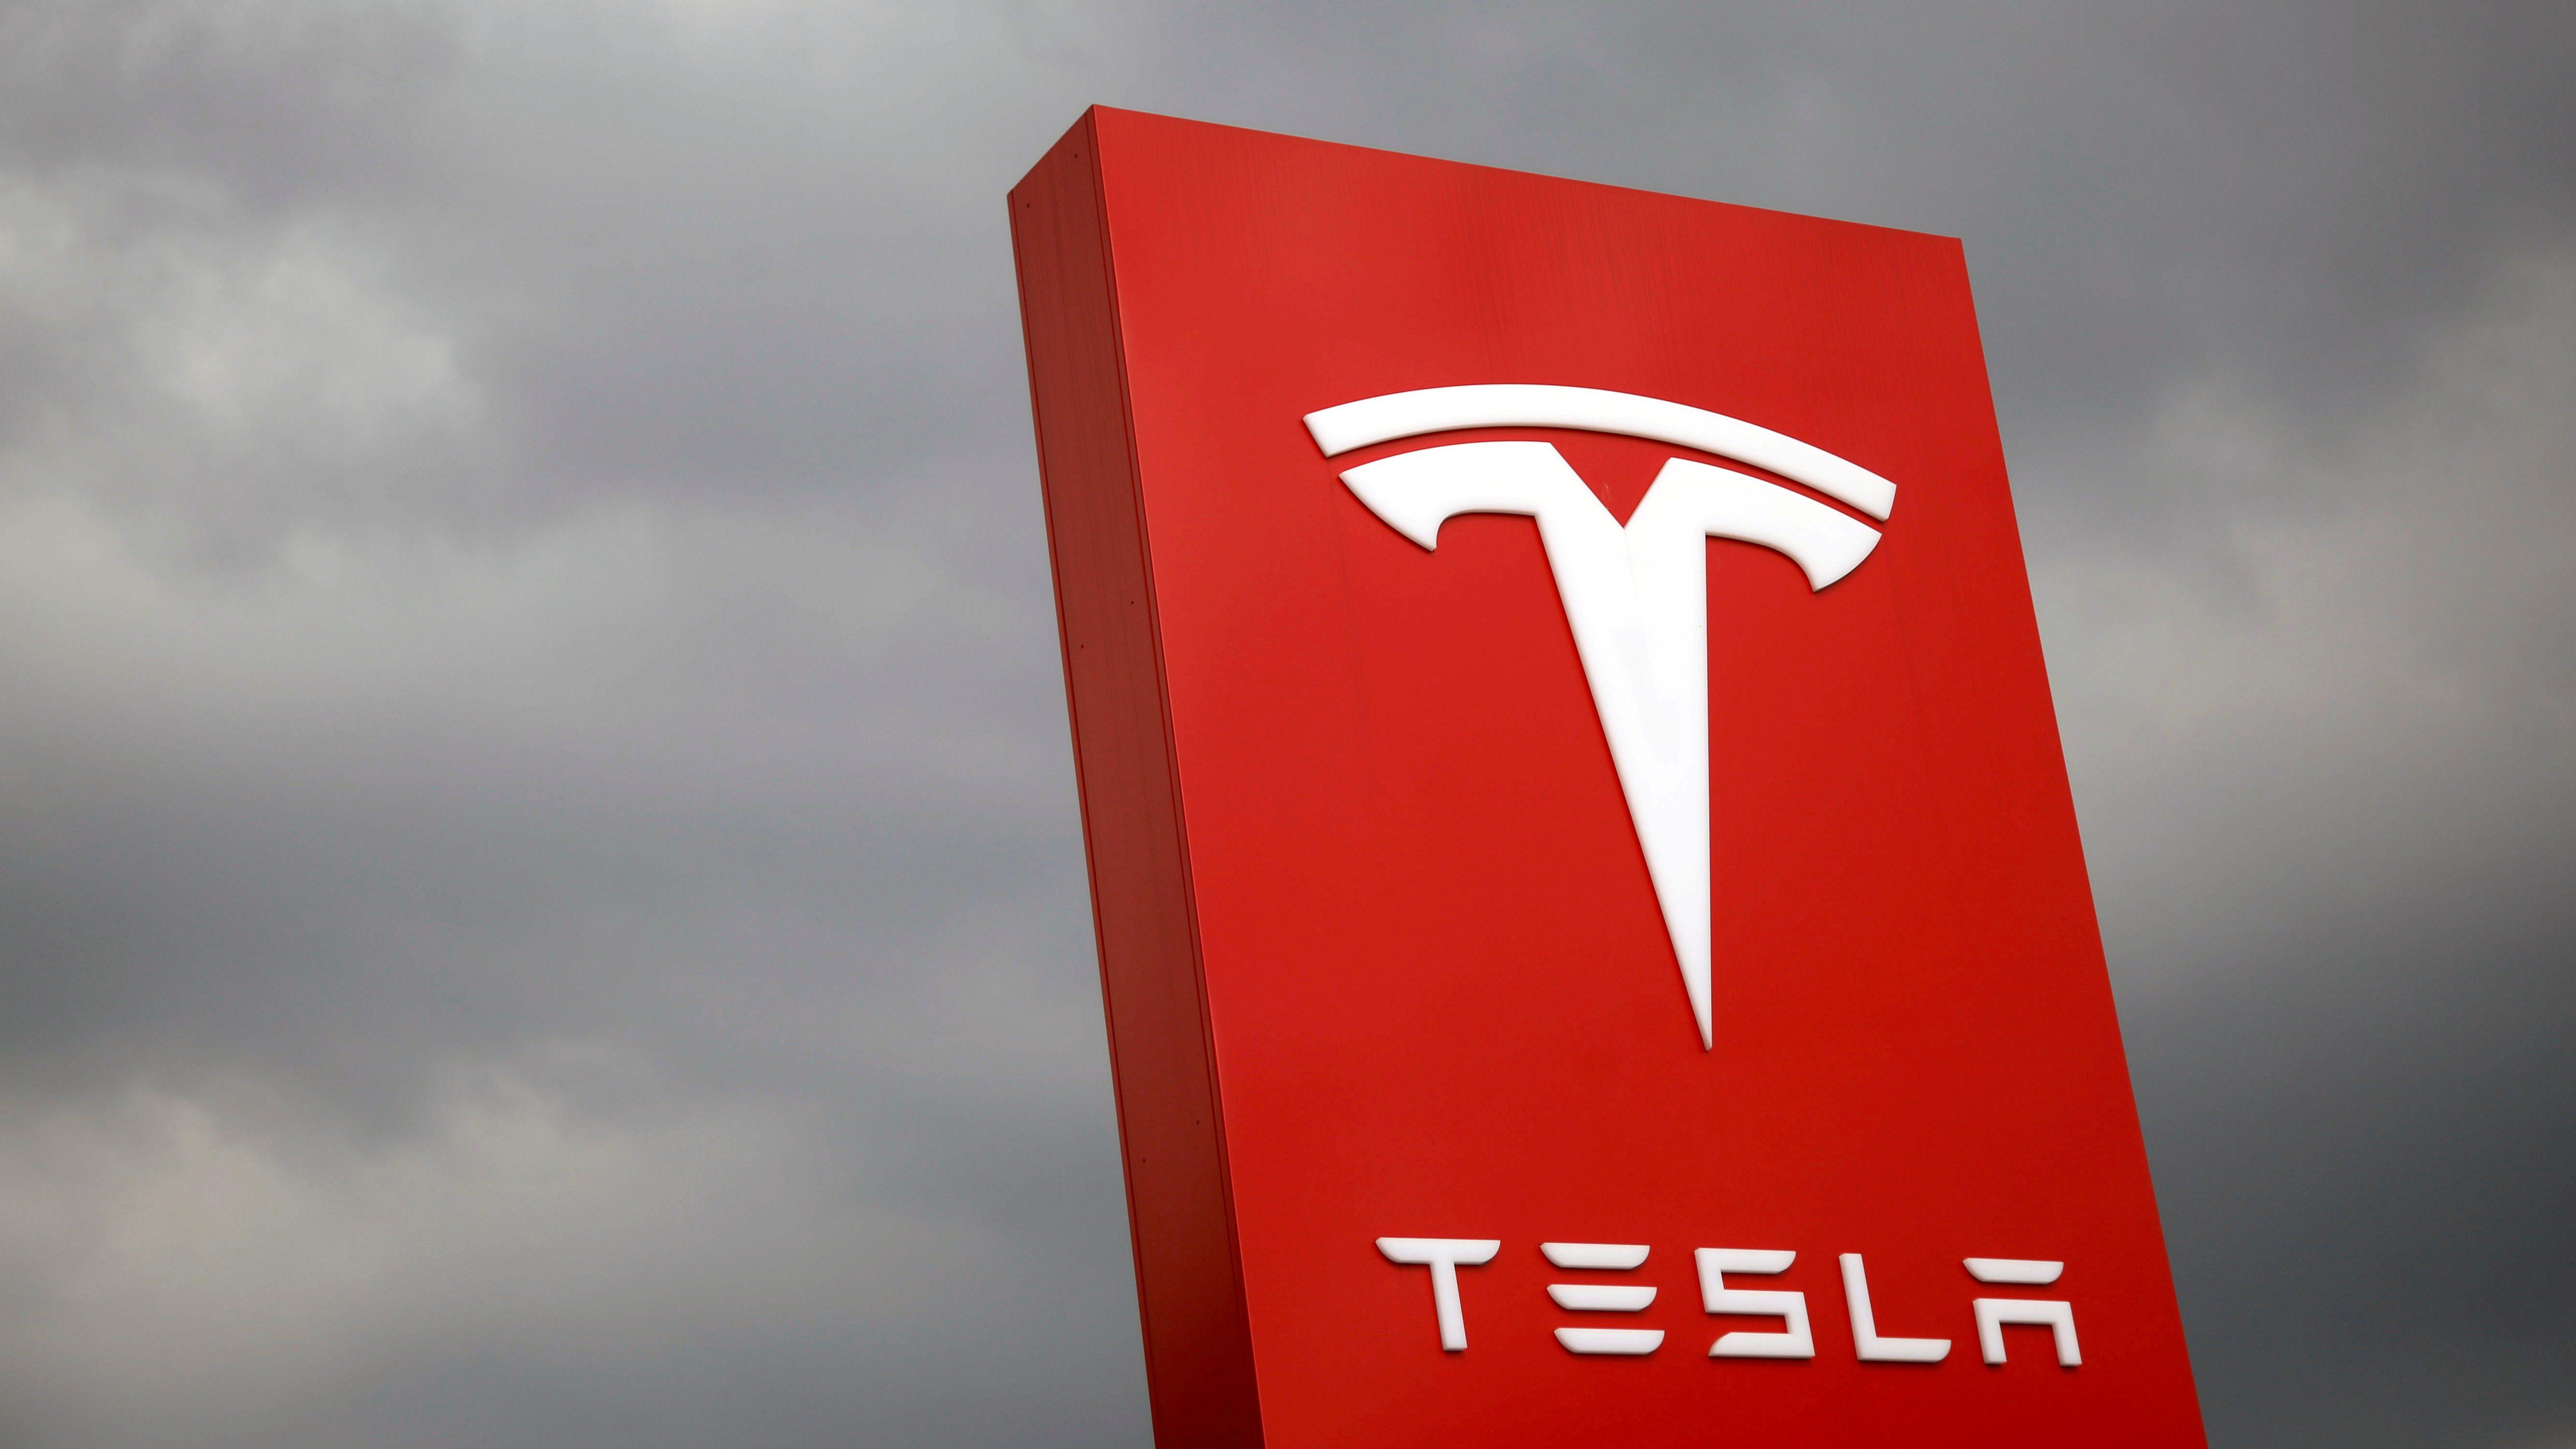 The logo of Tesla is seen in Taipei, Taiwan August 11, 2017.